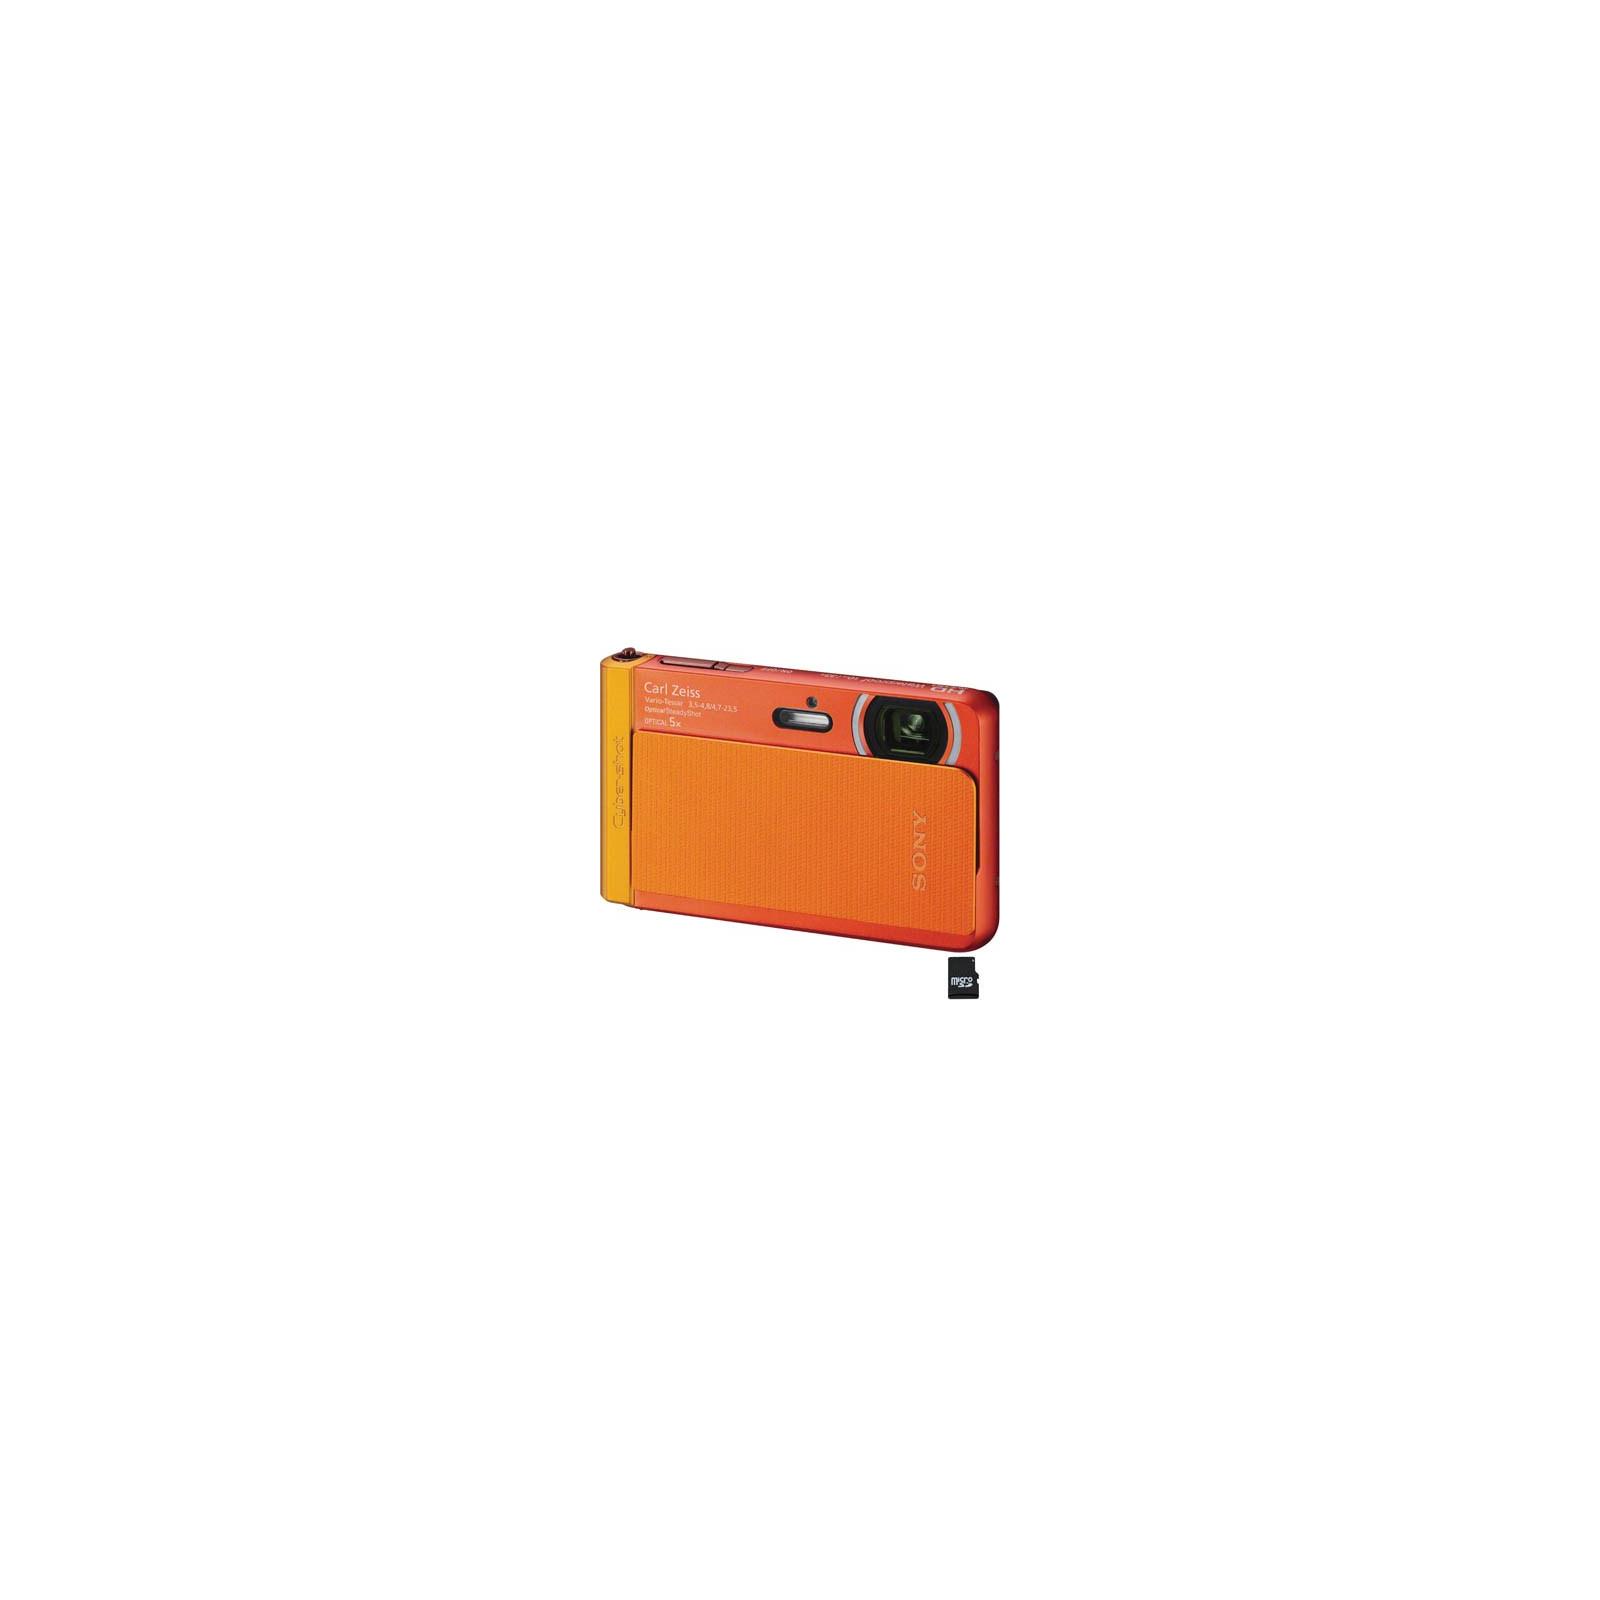 Цифровой фотоаппарат SONY Cyber-shot DSC-TX30 orange (DSCTX30D.RU3)